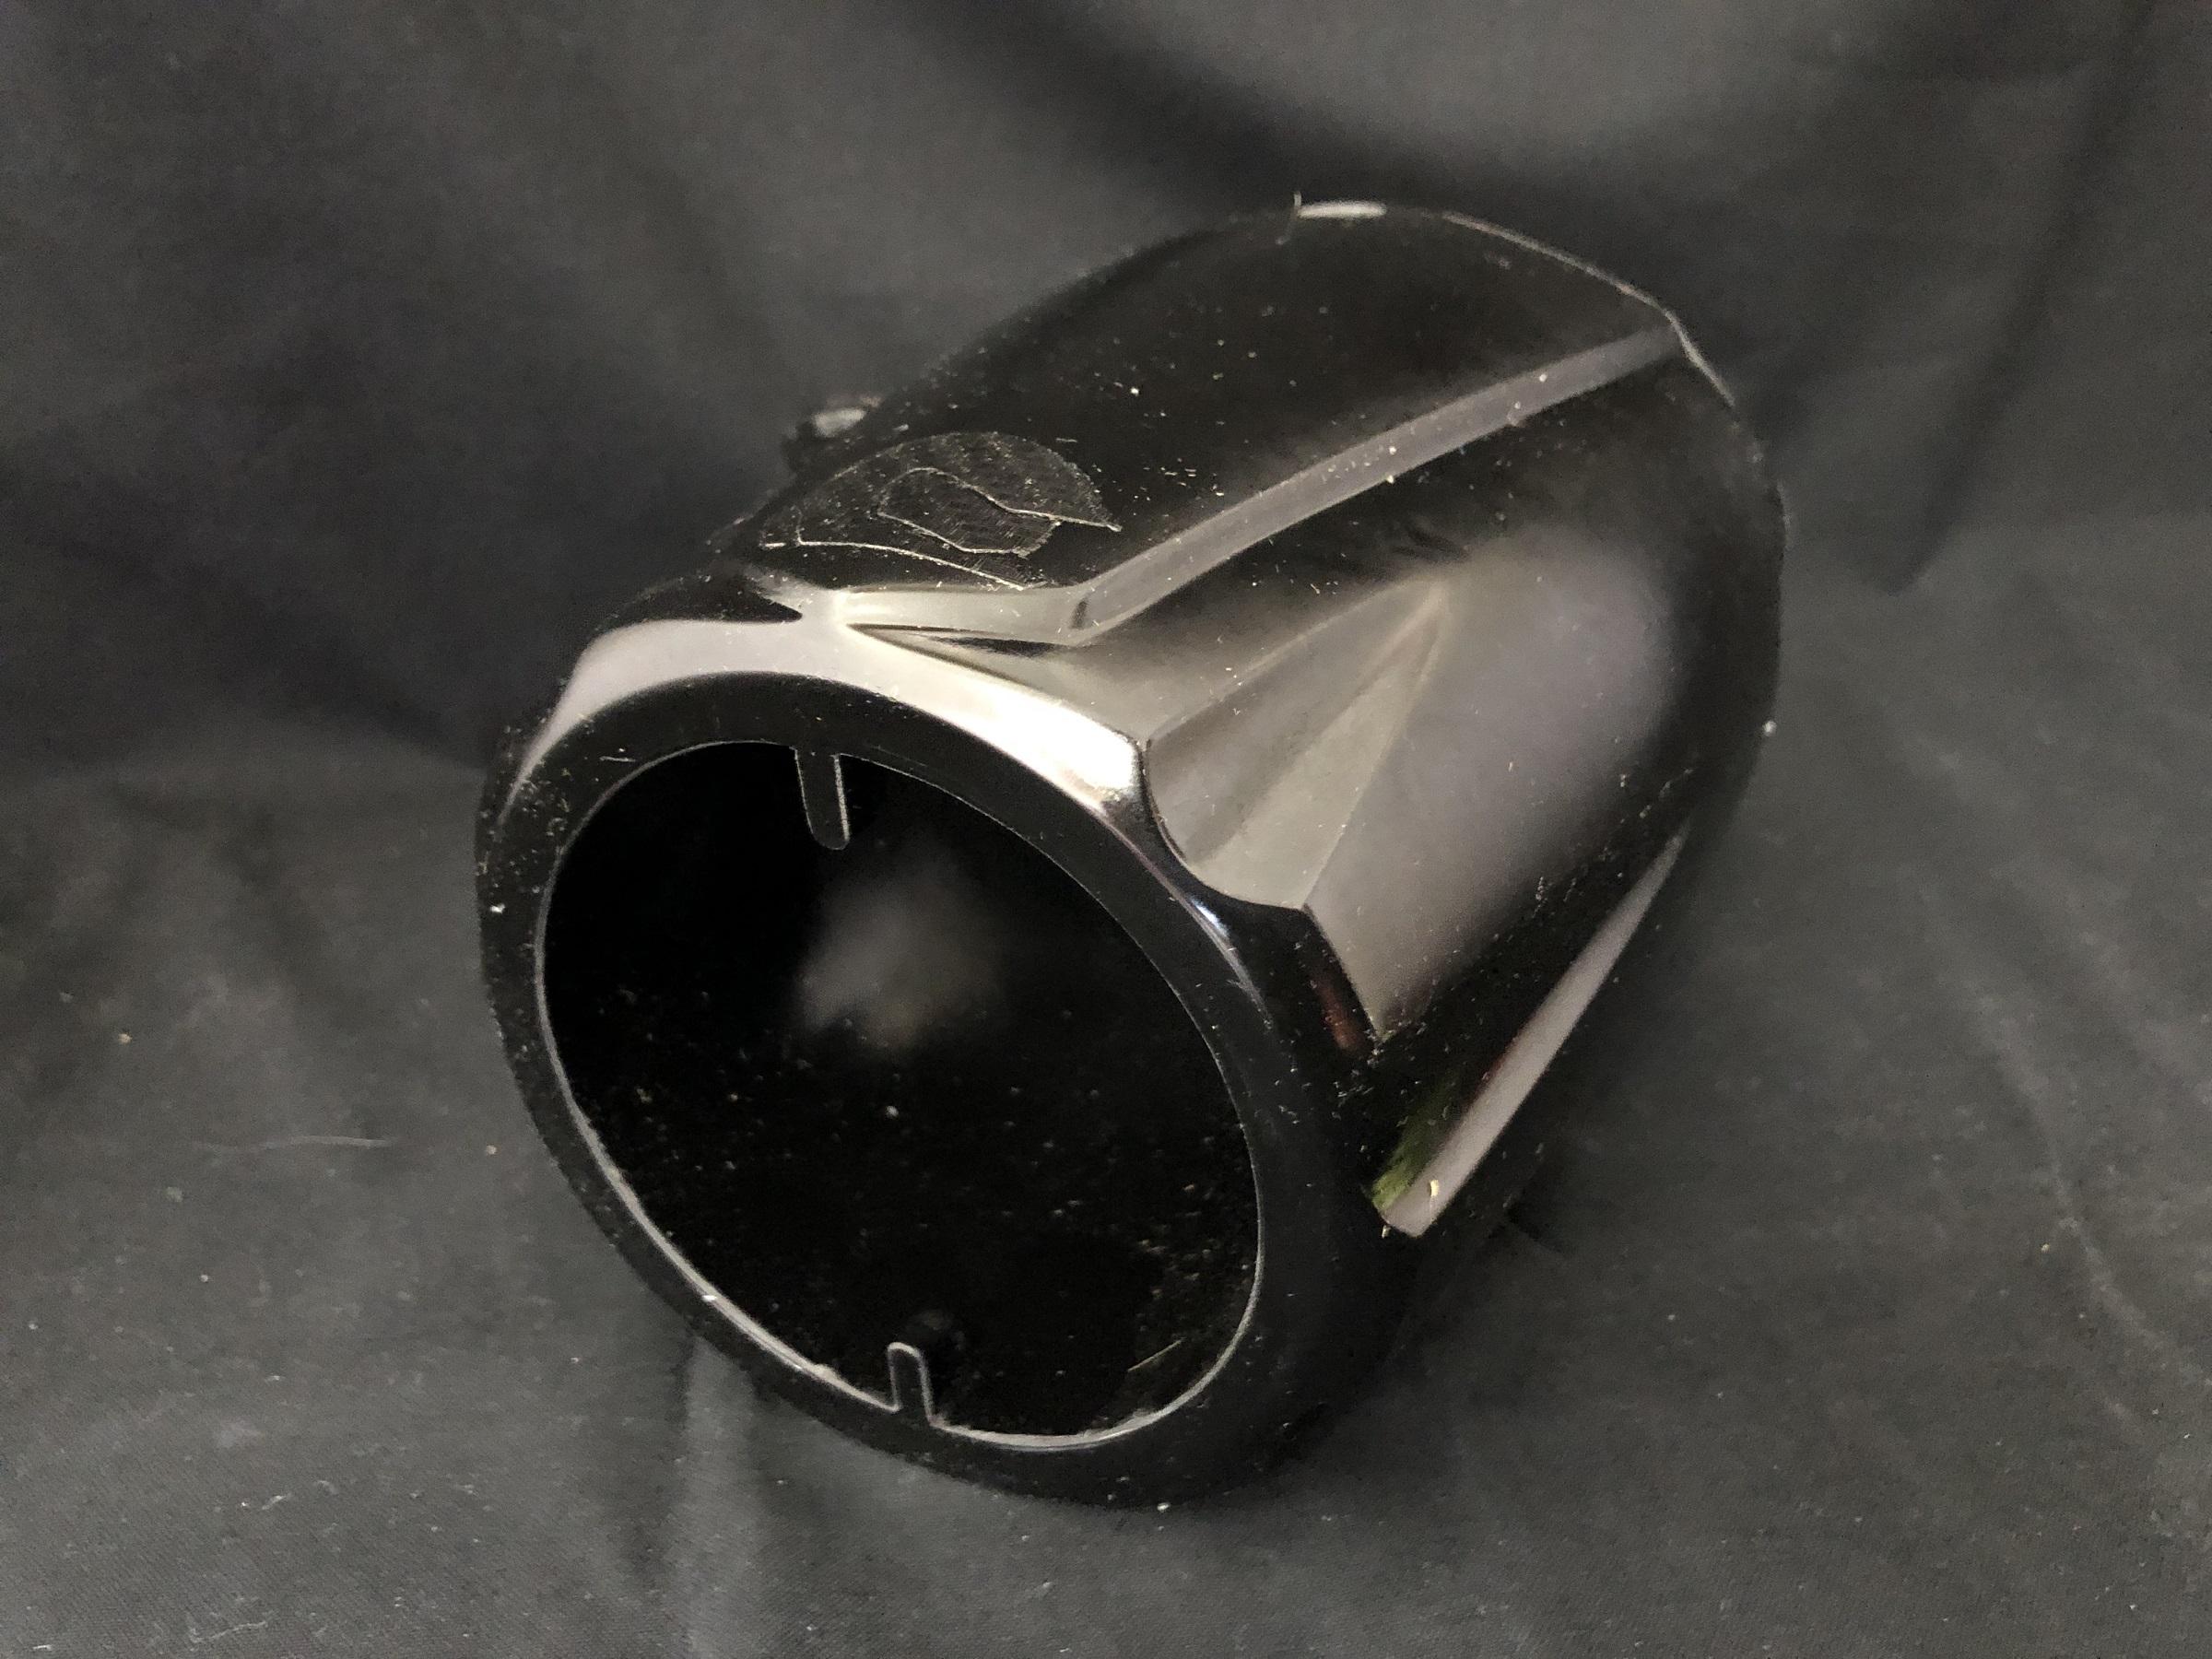 【PW-01-800】Pro Water Craft エクステンドステアリングノズル KAW440/550